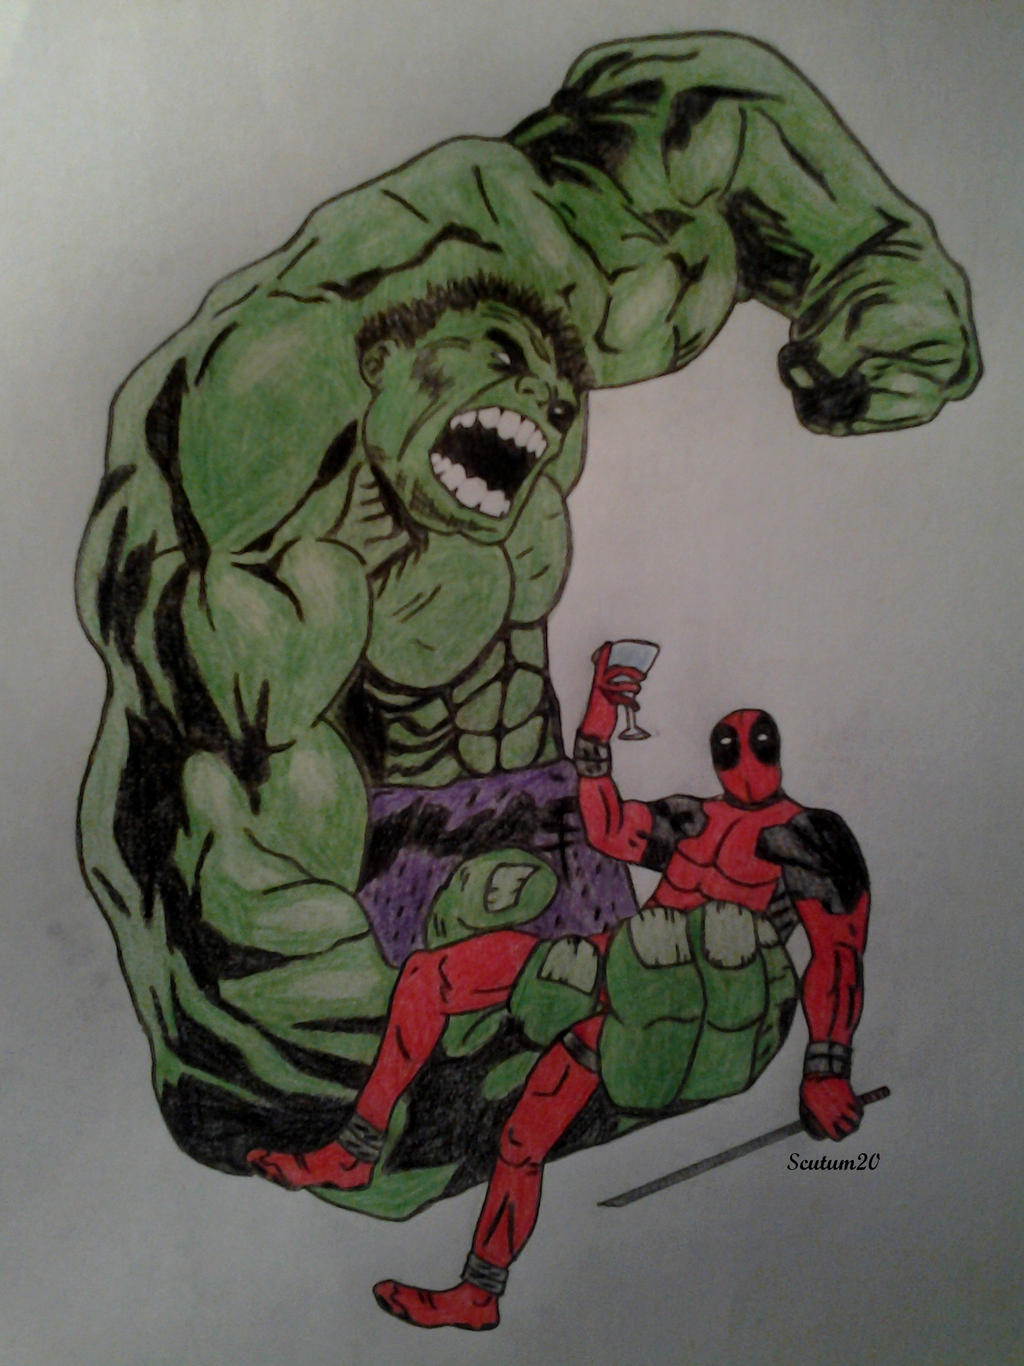 Deadpool and Hulk by Scutum20